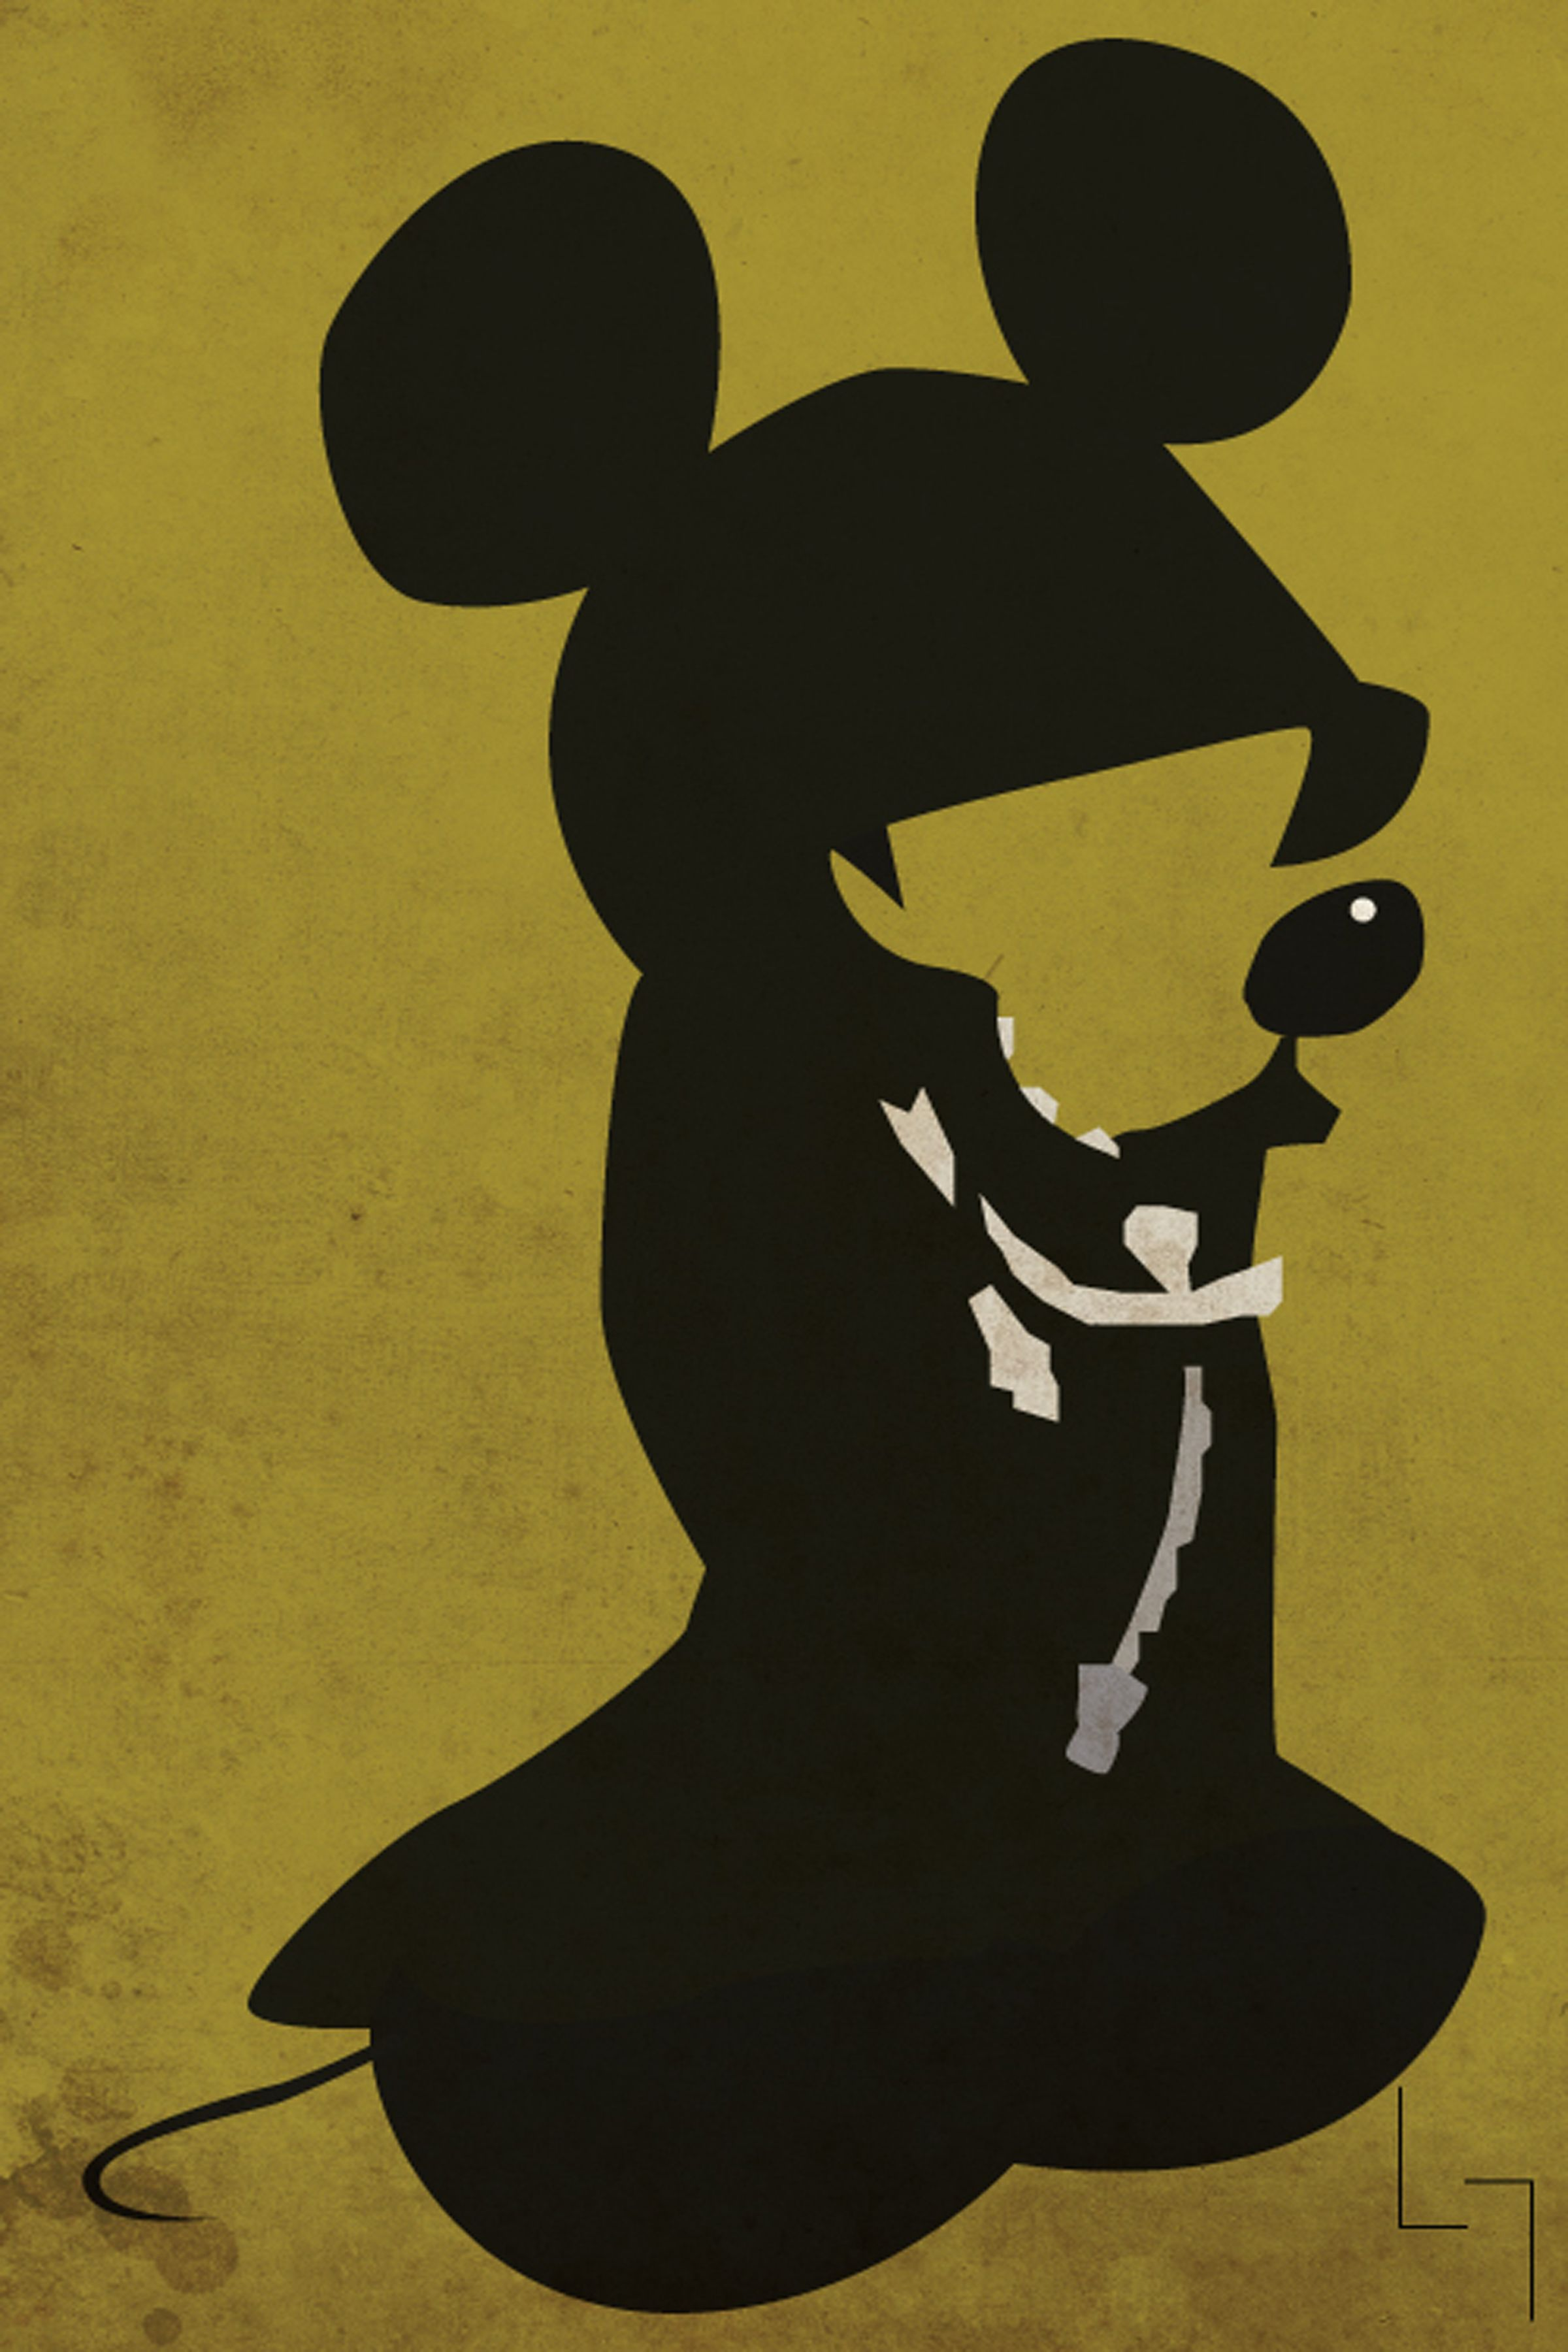 King Mickey, Kingdom Hearts | Other Disney | Pinterest | Video Games ...